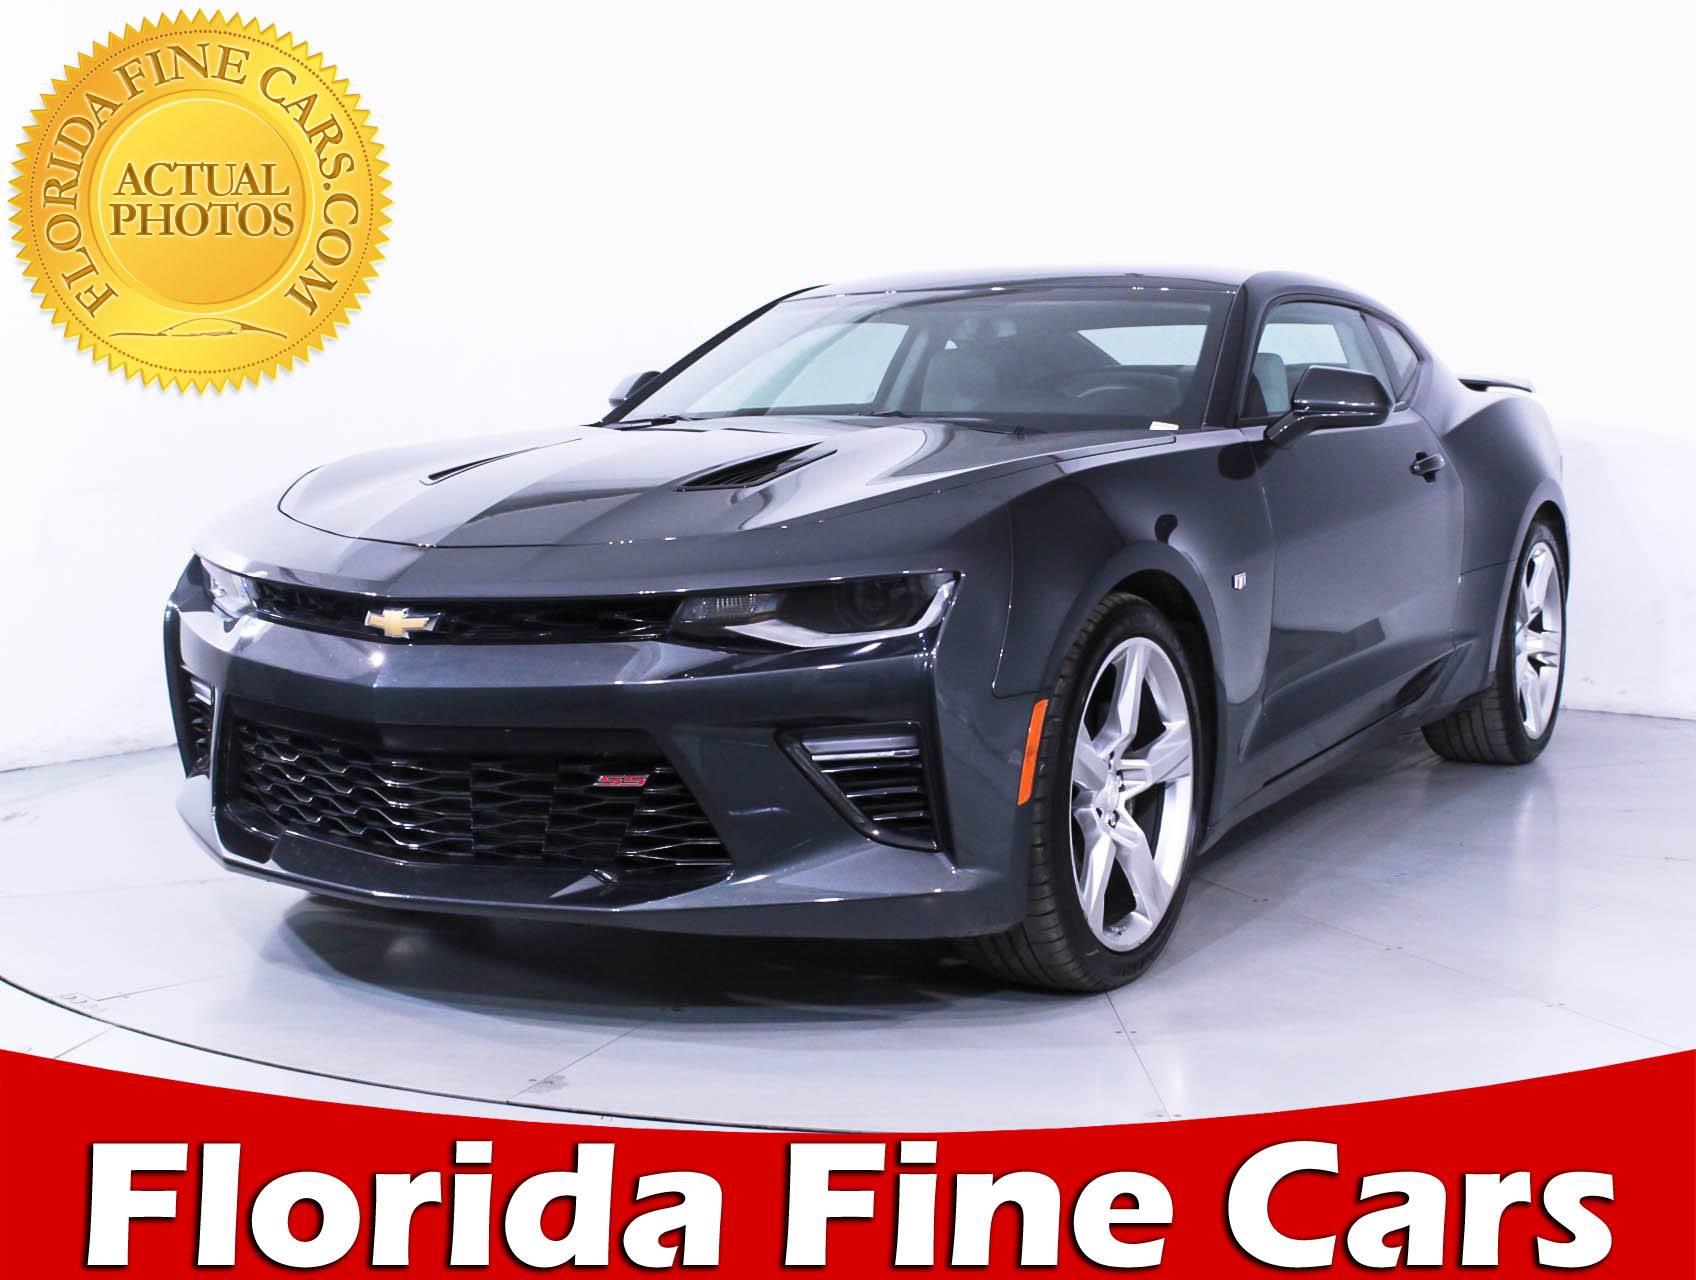 Used 2017 CHEVROLET CAMARO 1SS Coupe for sale in MIAMI, FL | 90432 ...